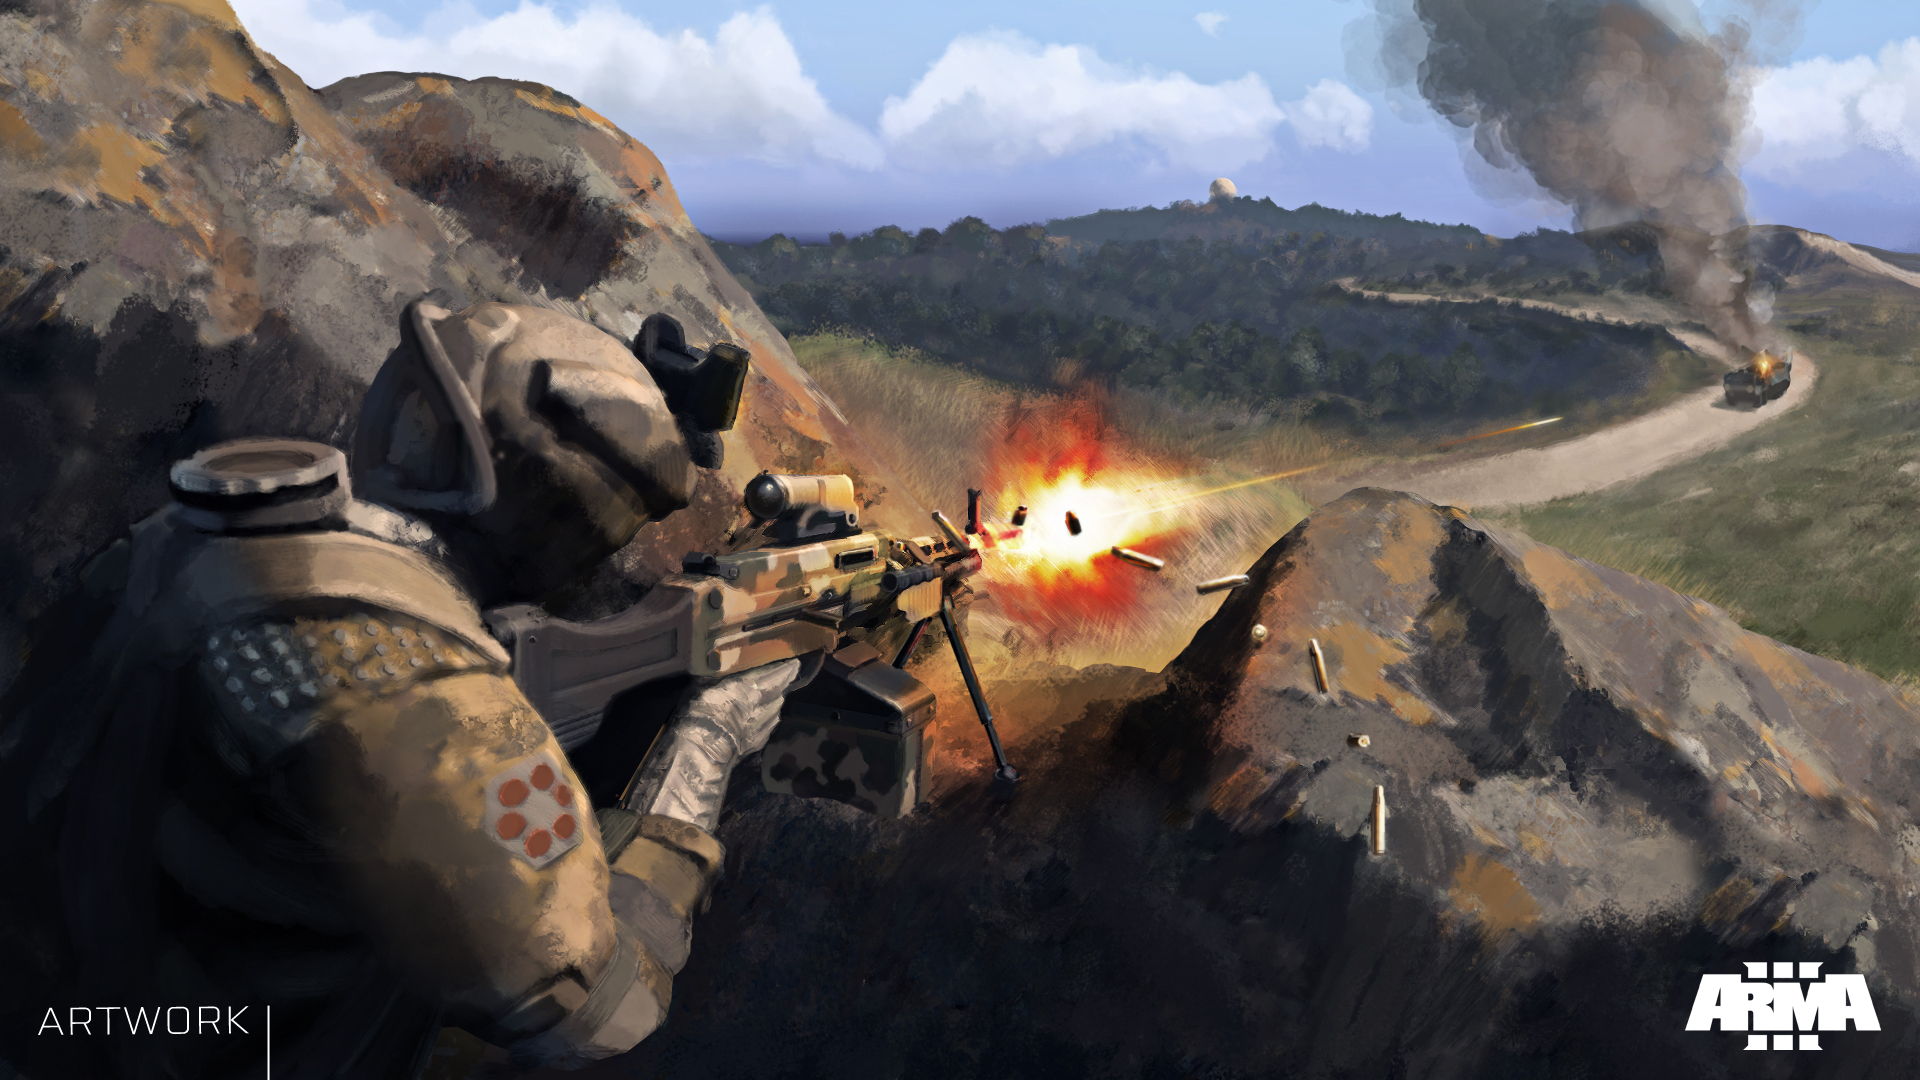 Arma 3 Marksmen DLC available on April 8th   Blog   Bohemia Interactive